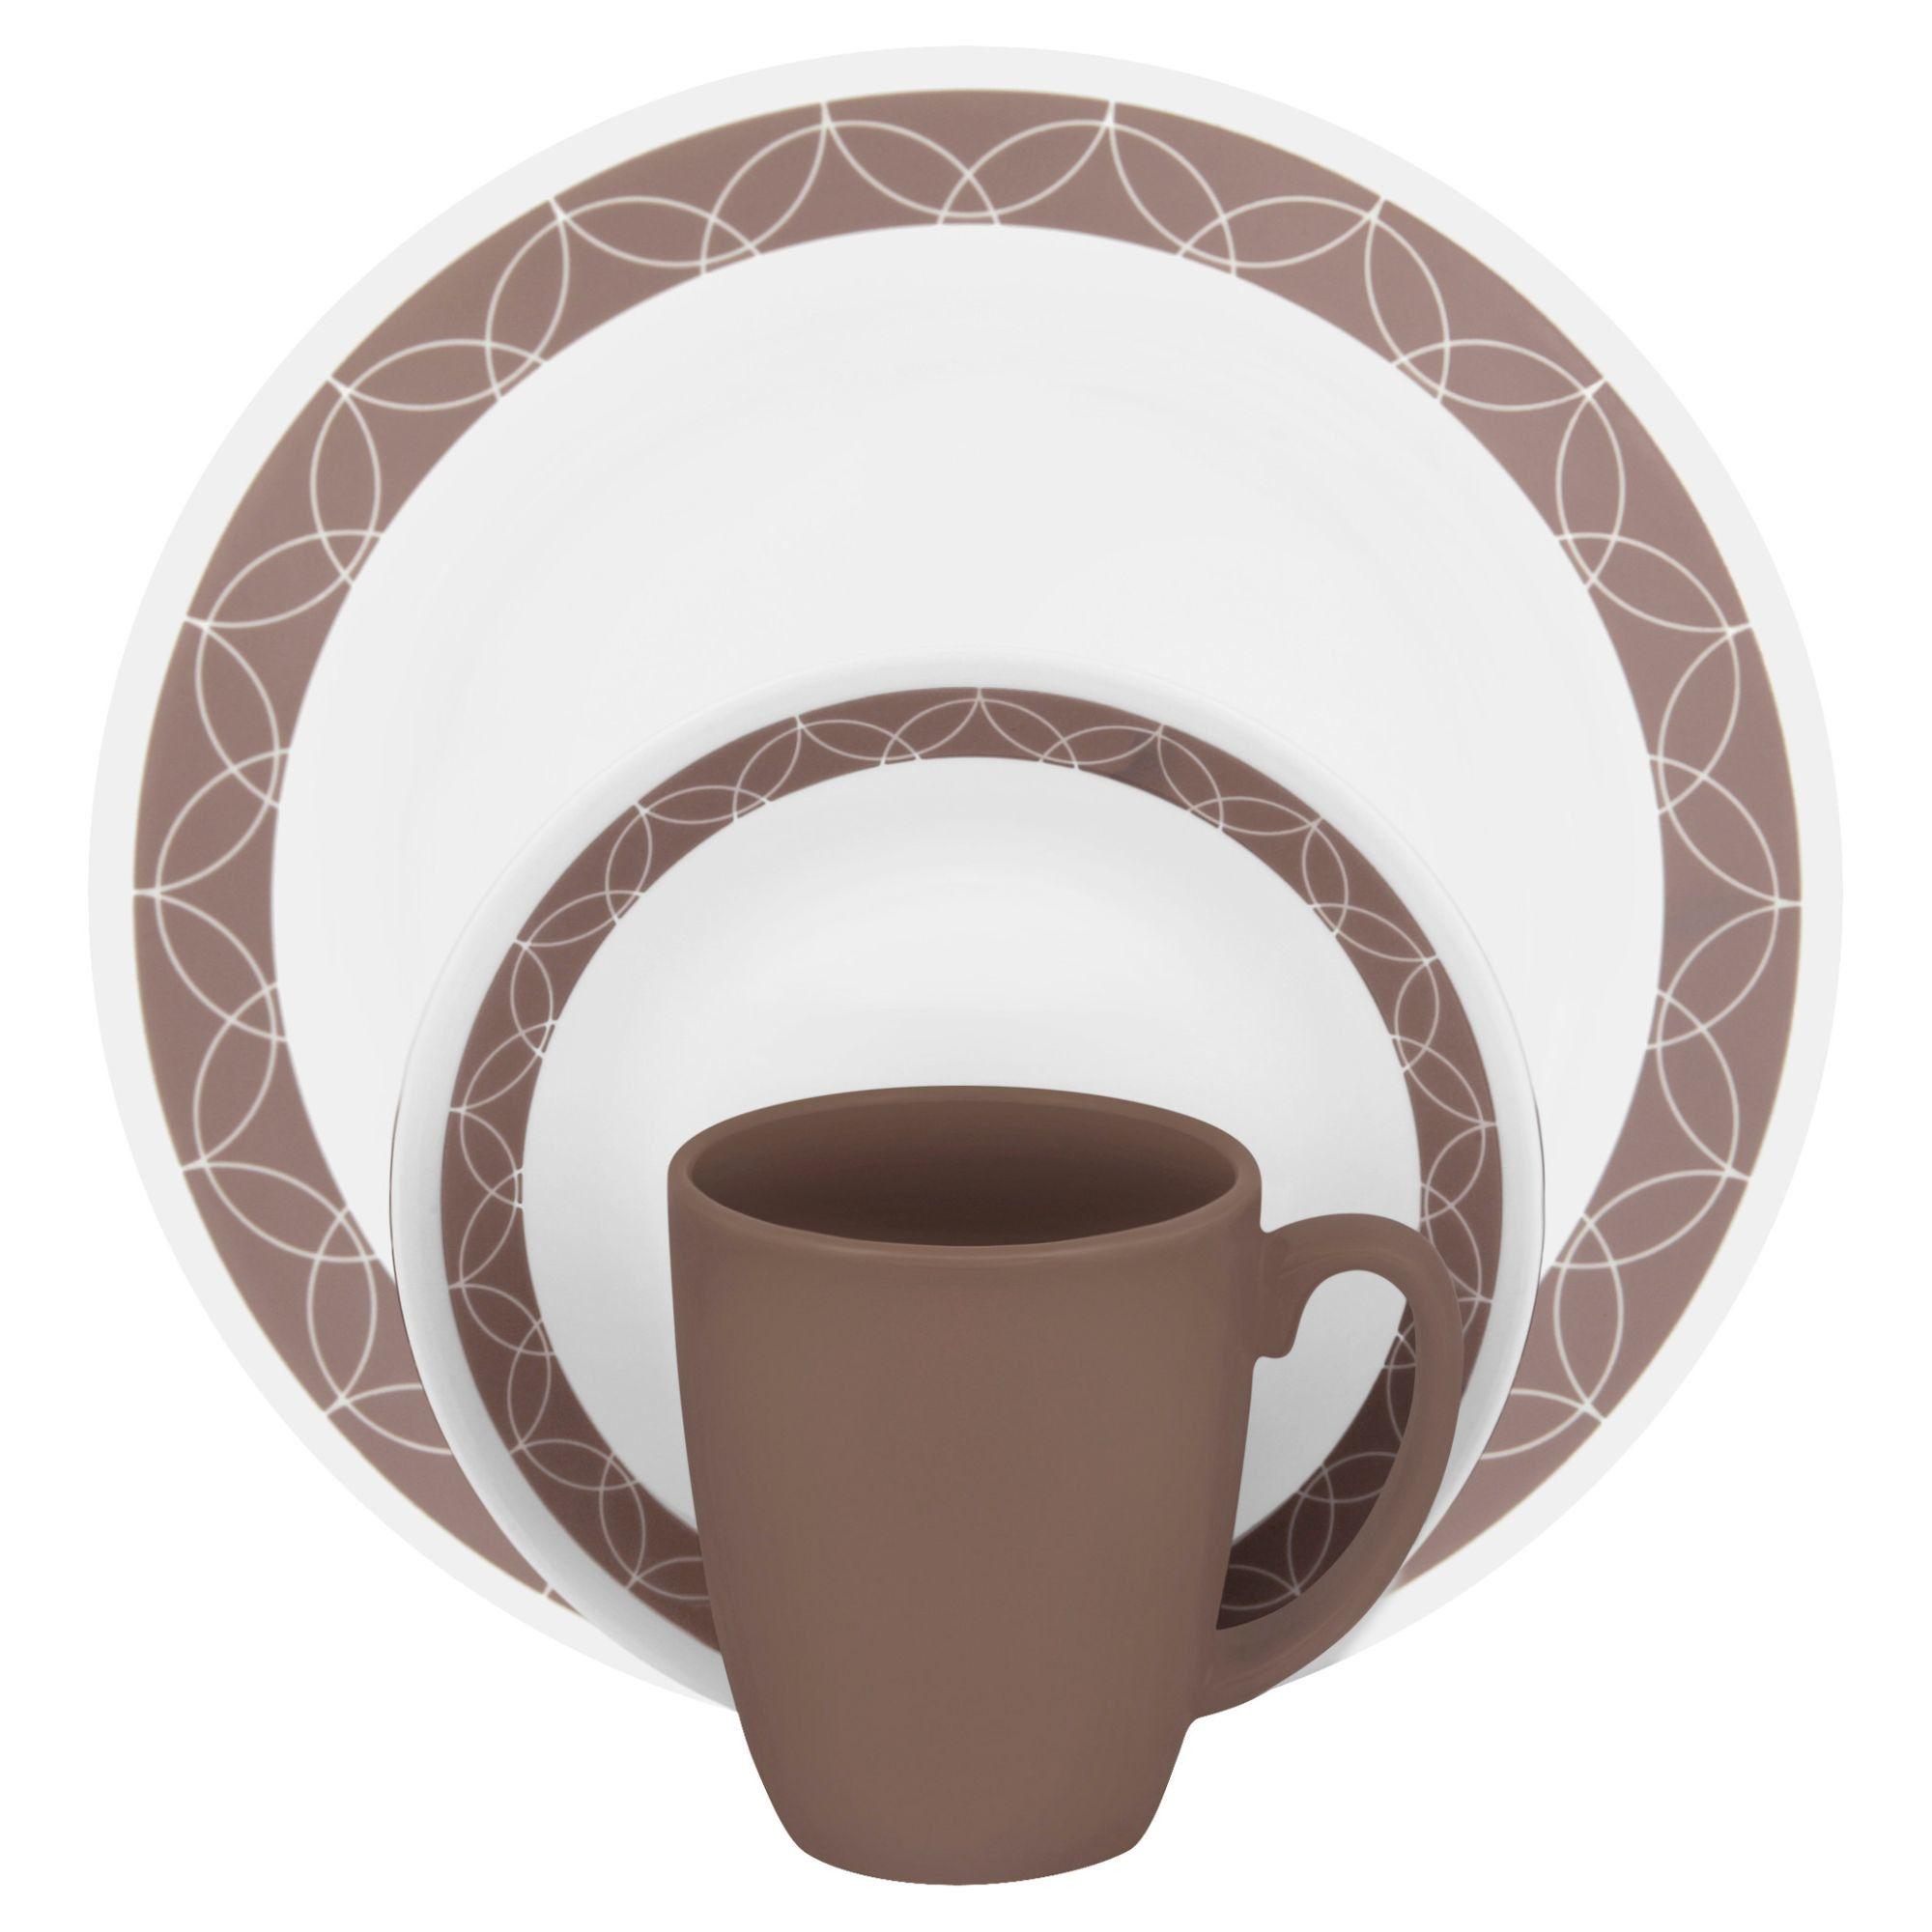 Livingware 16 Piece Dinnerware Set Service for 4  sc 1 st  Pinterest & Livingware 16 Piece Dinnerware Set Service for 4 | Dinnerware ...